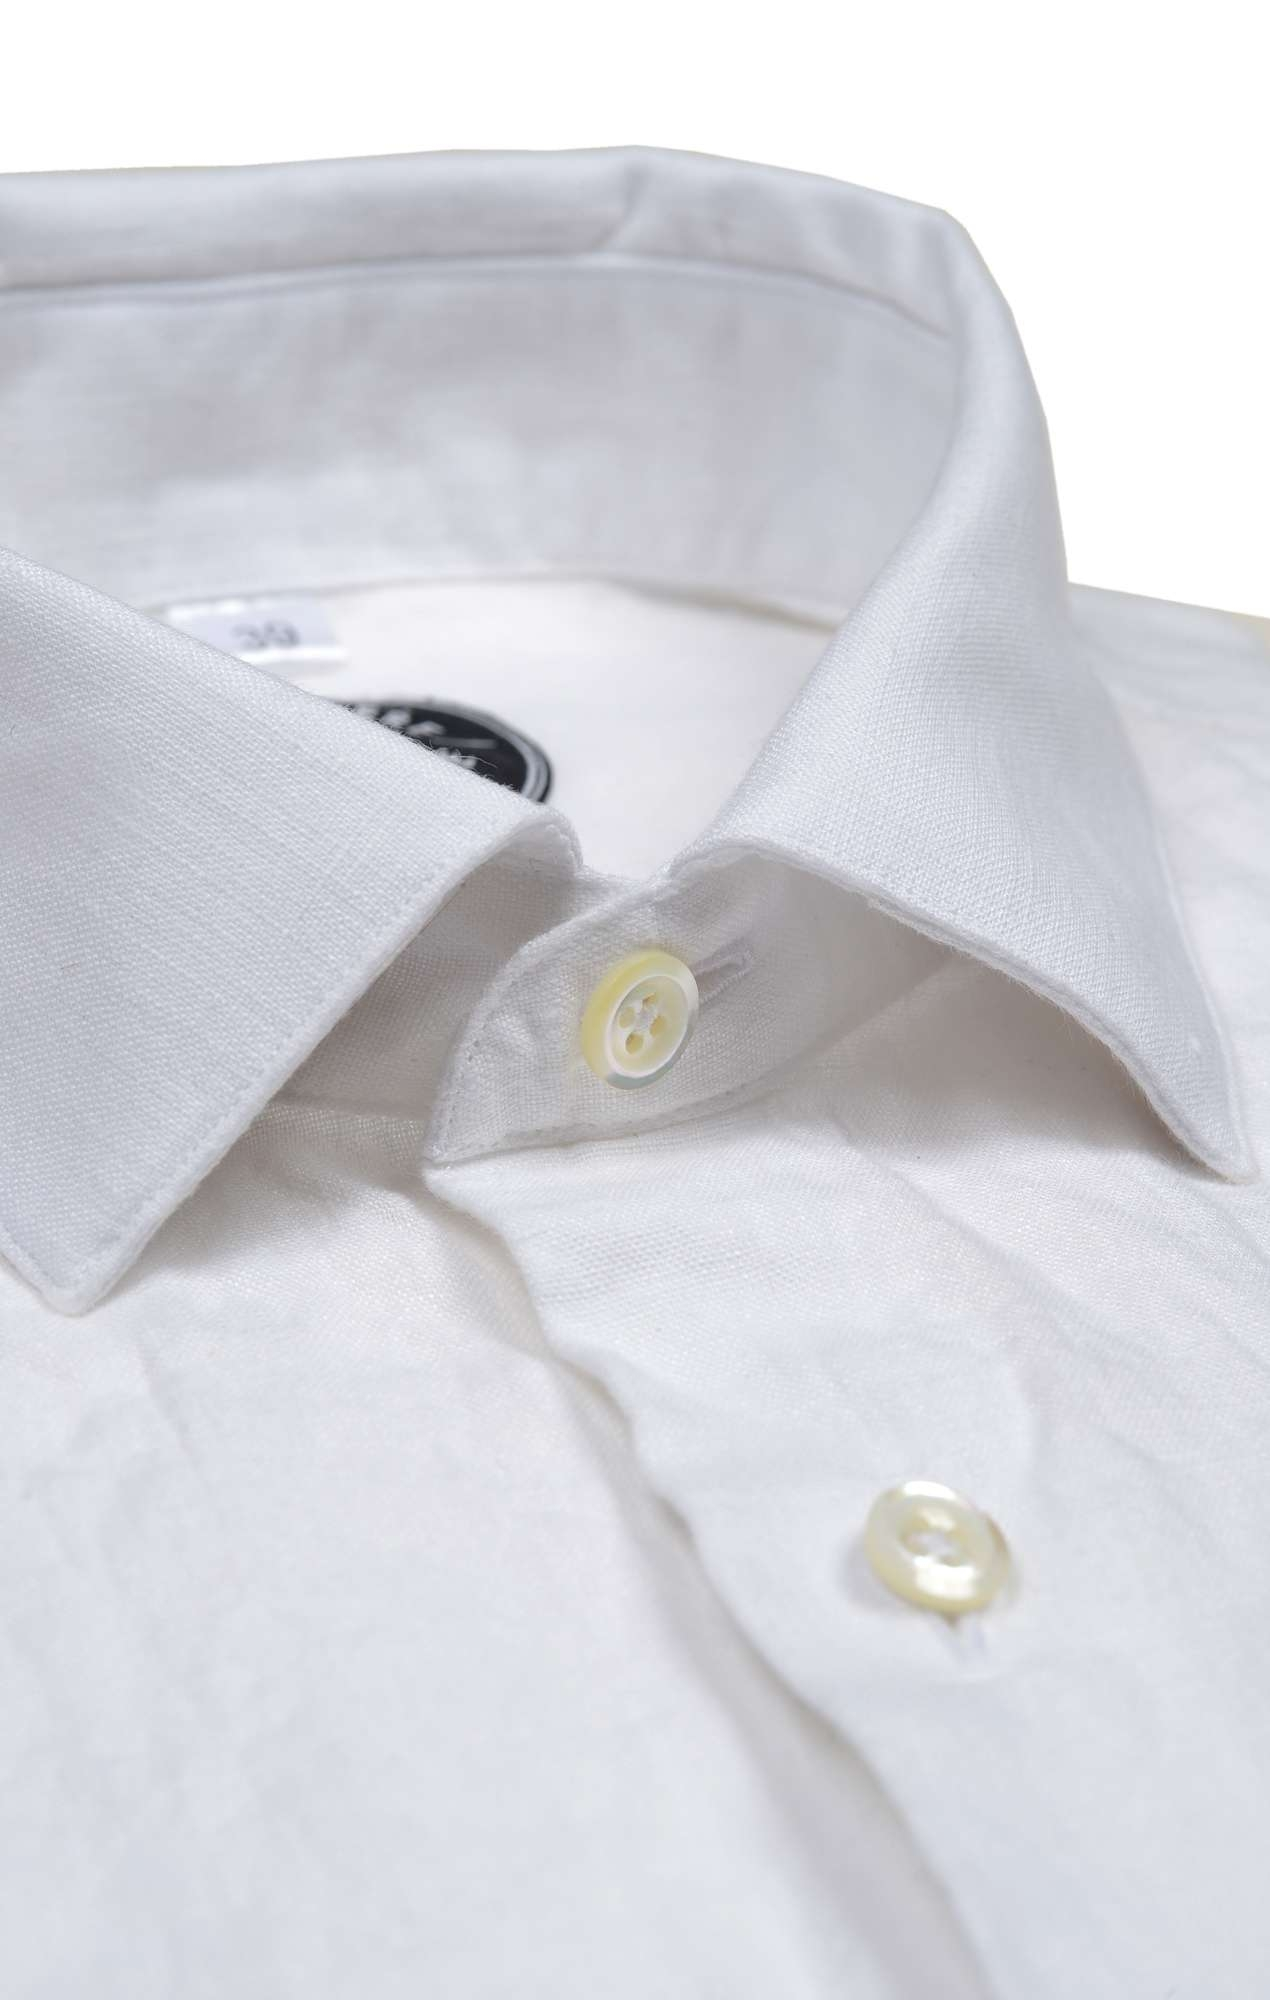 Chemise lin blanc Toutes nos chemises